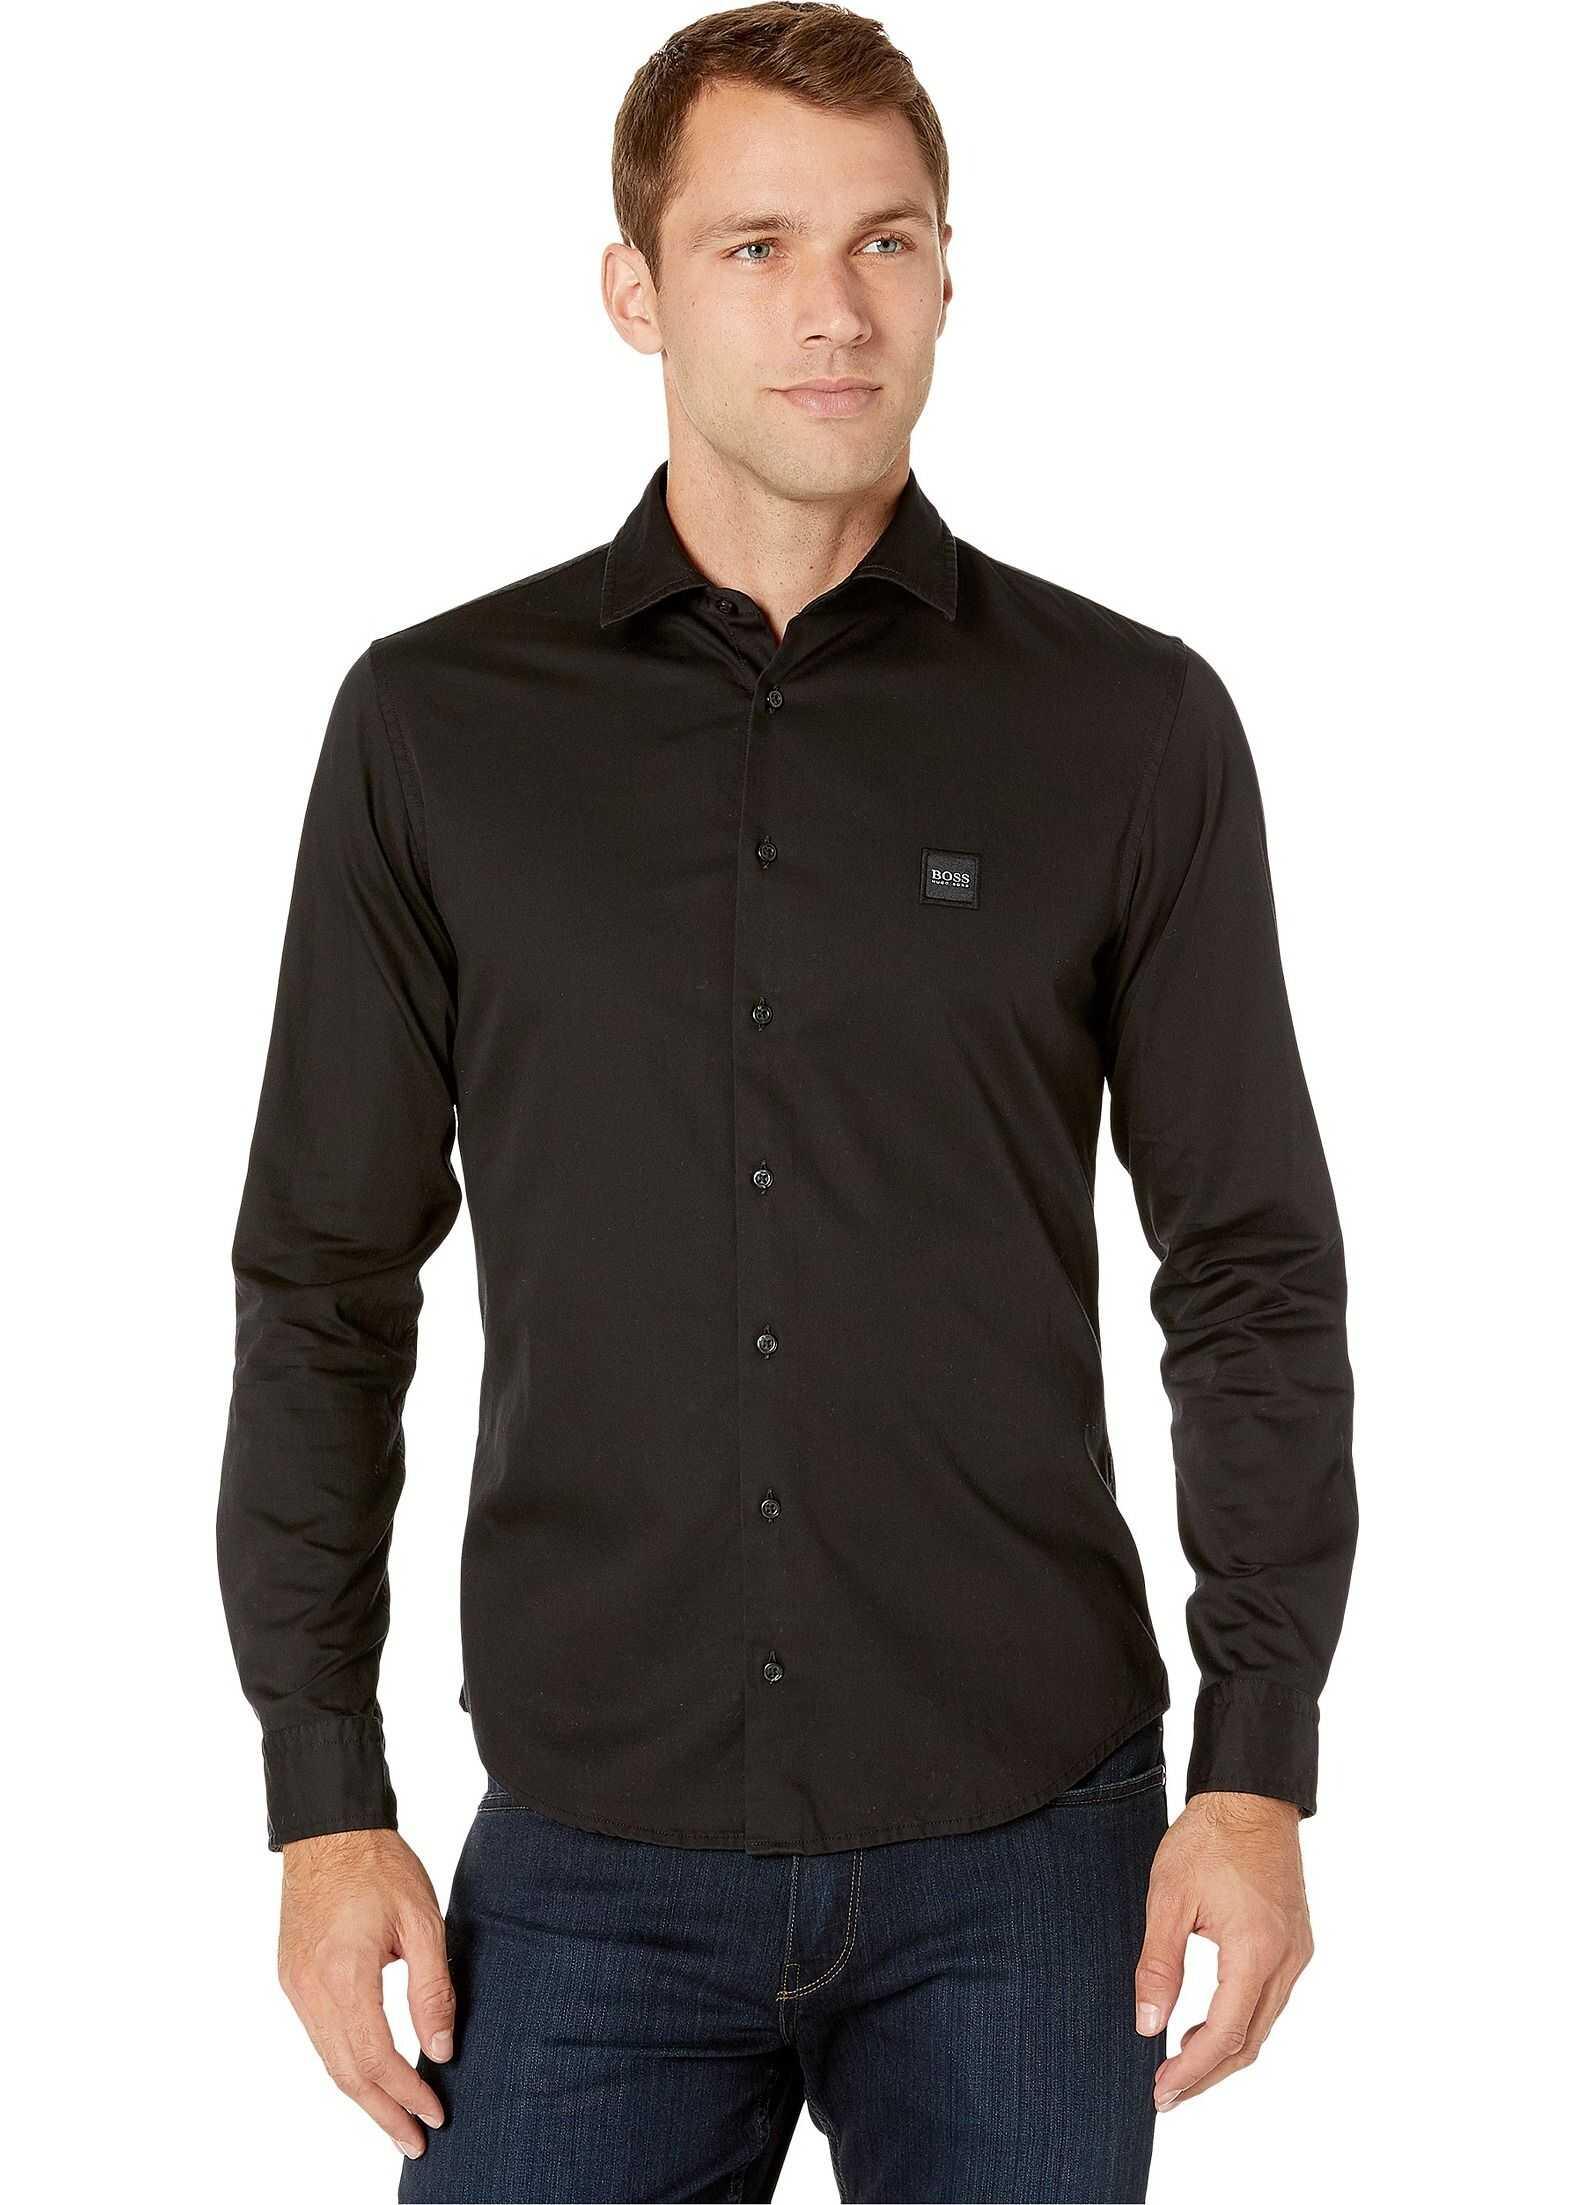 BOSS Hugo Boss Mypop_2 Shirt Black